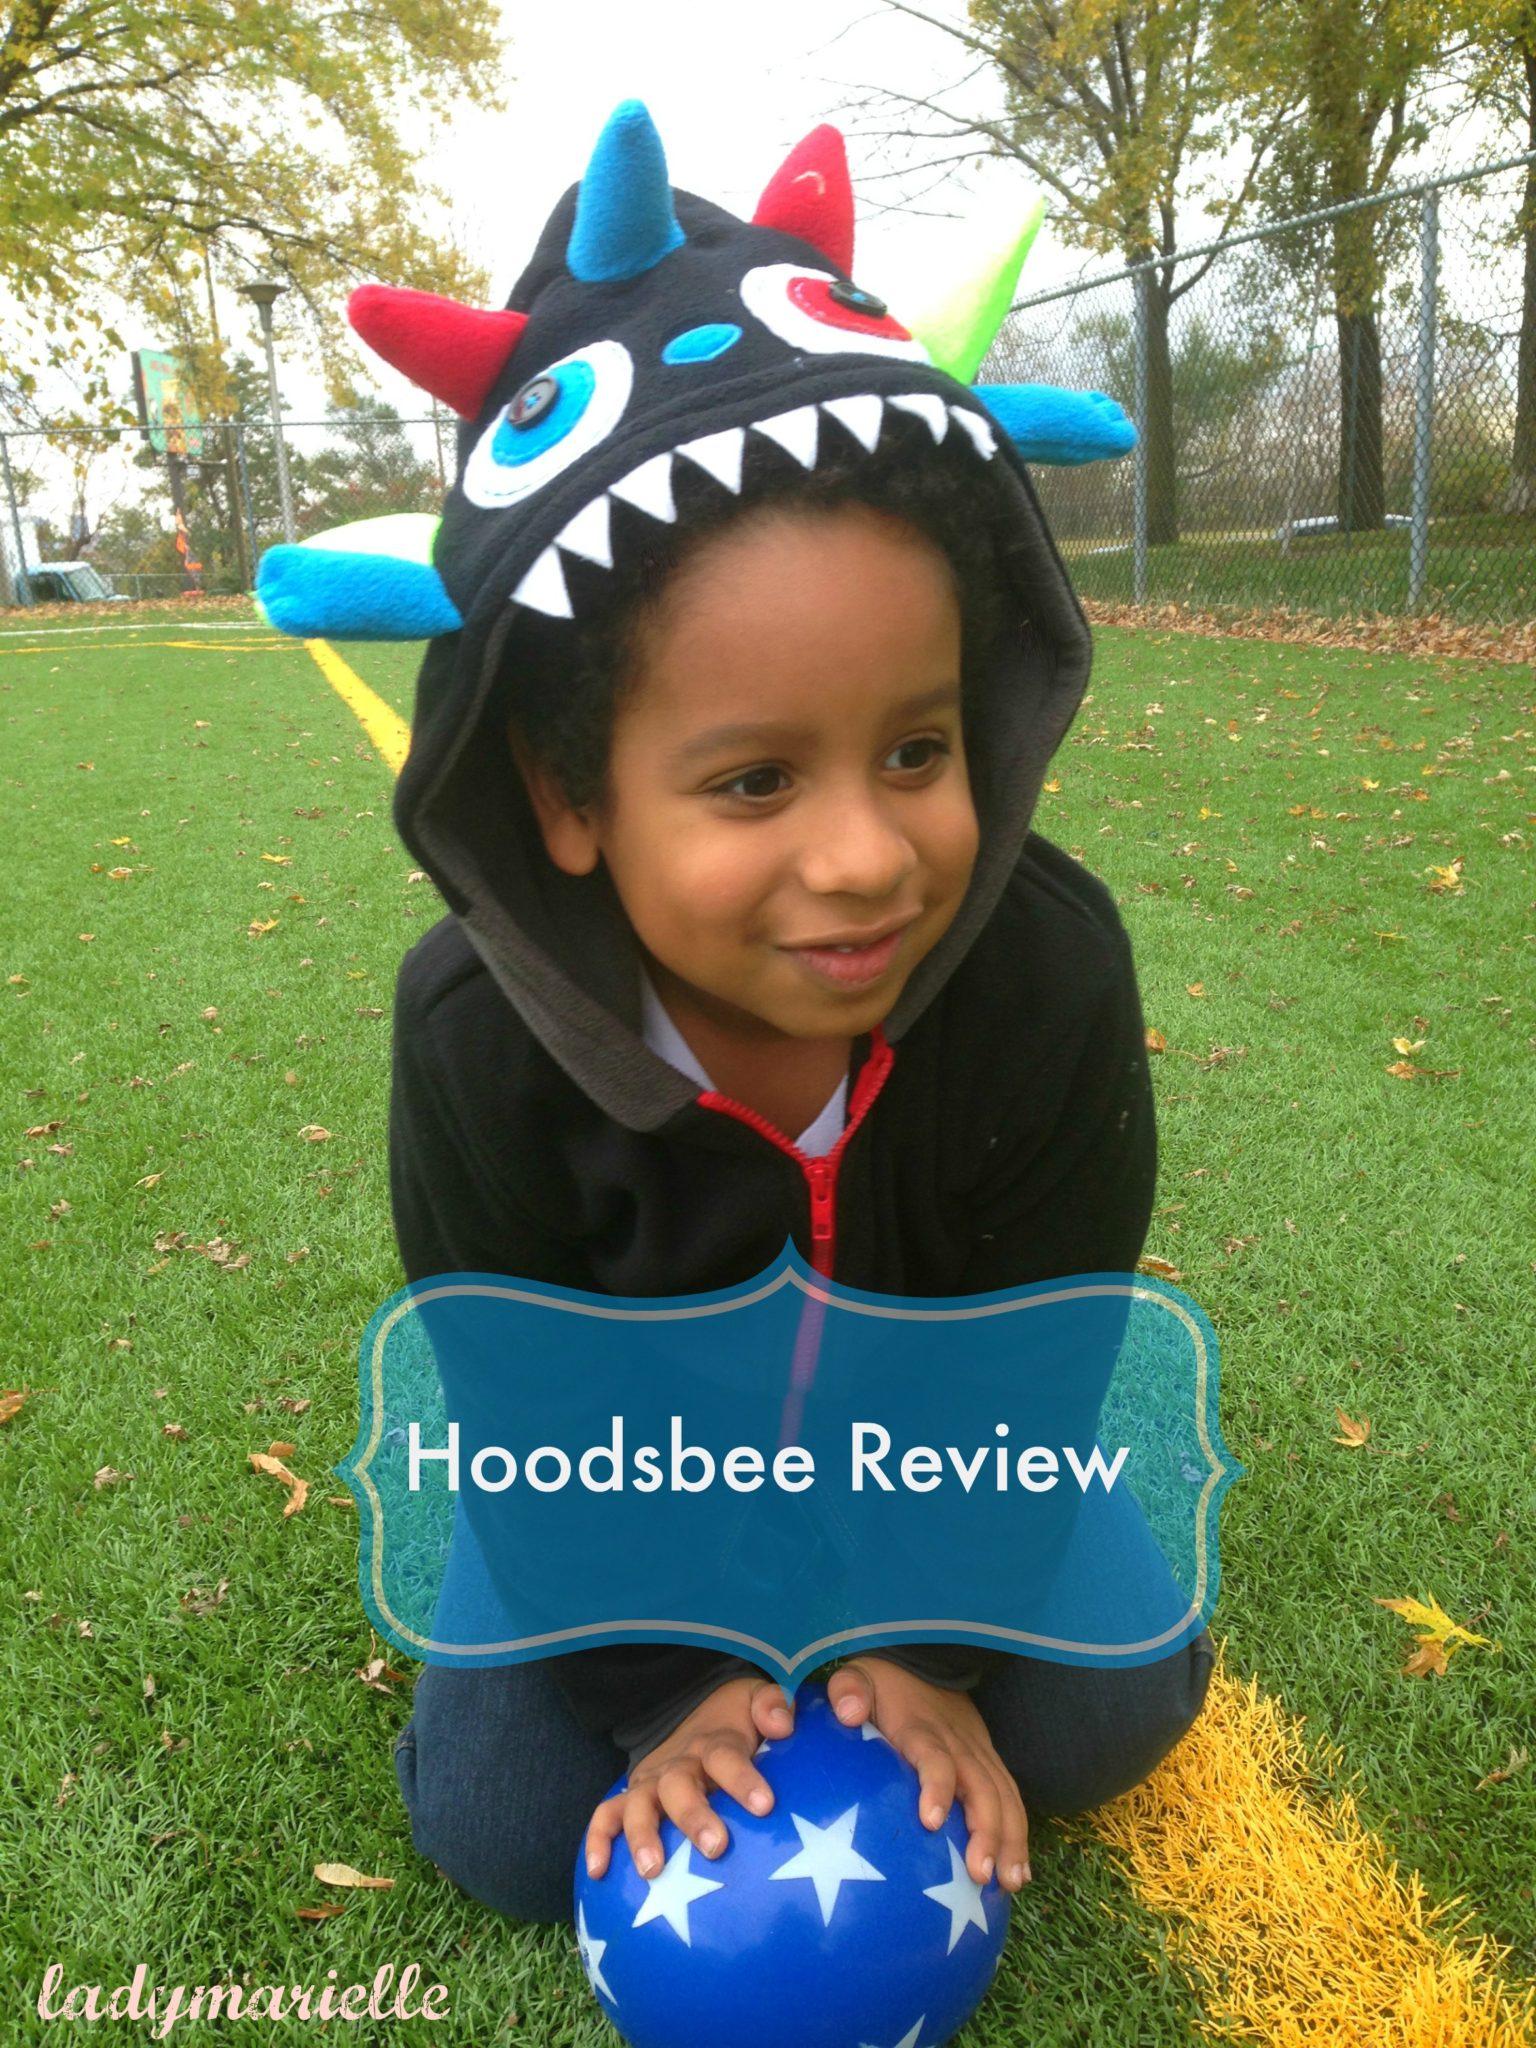 Hoodsbee Review